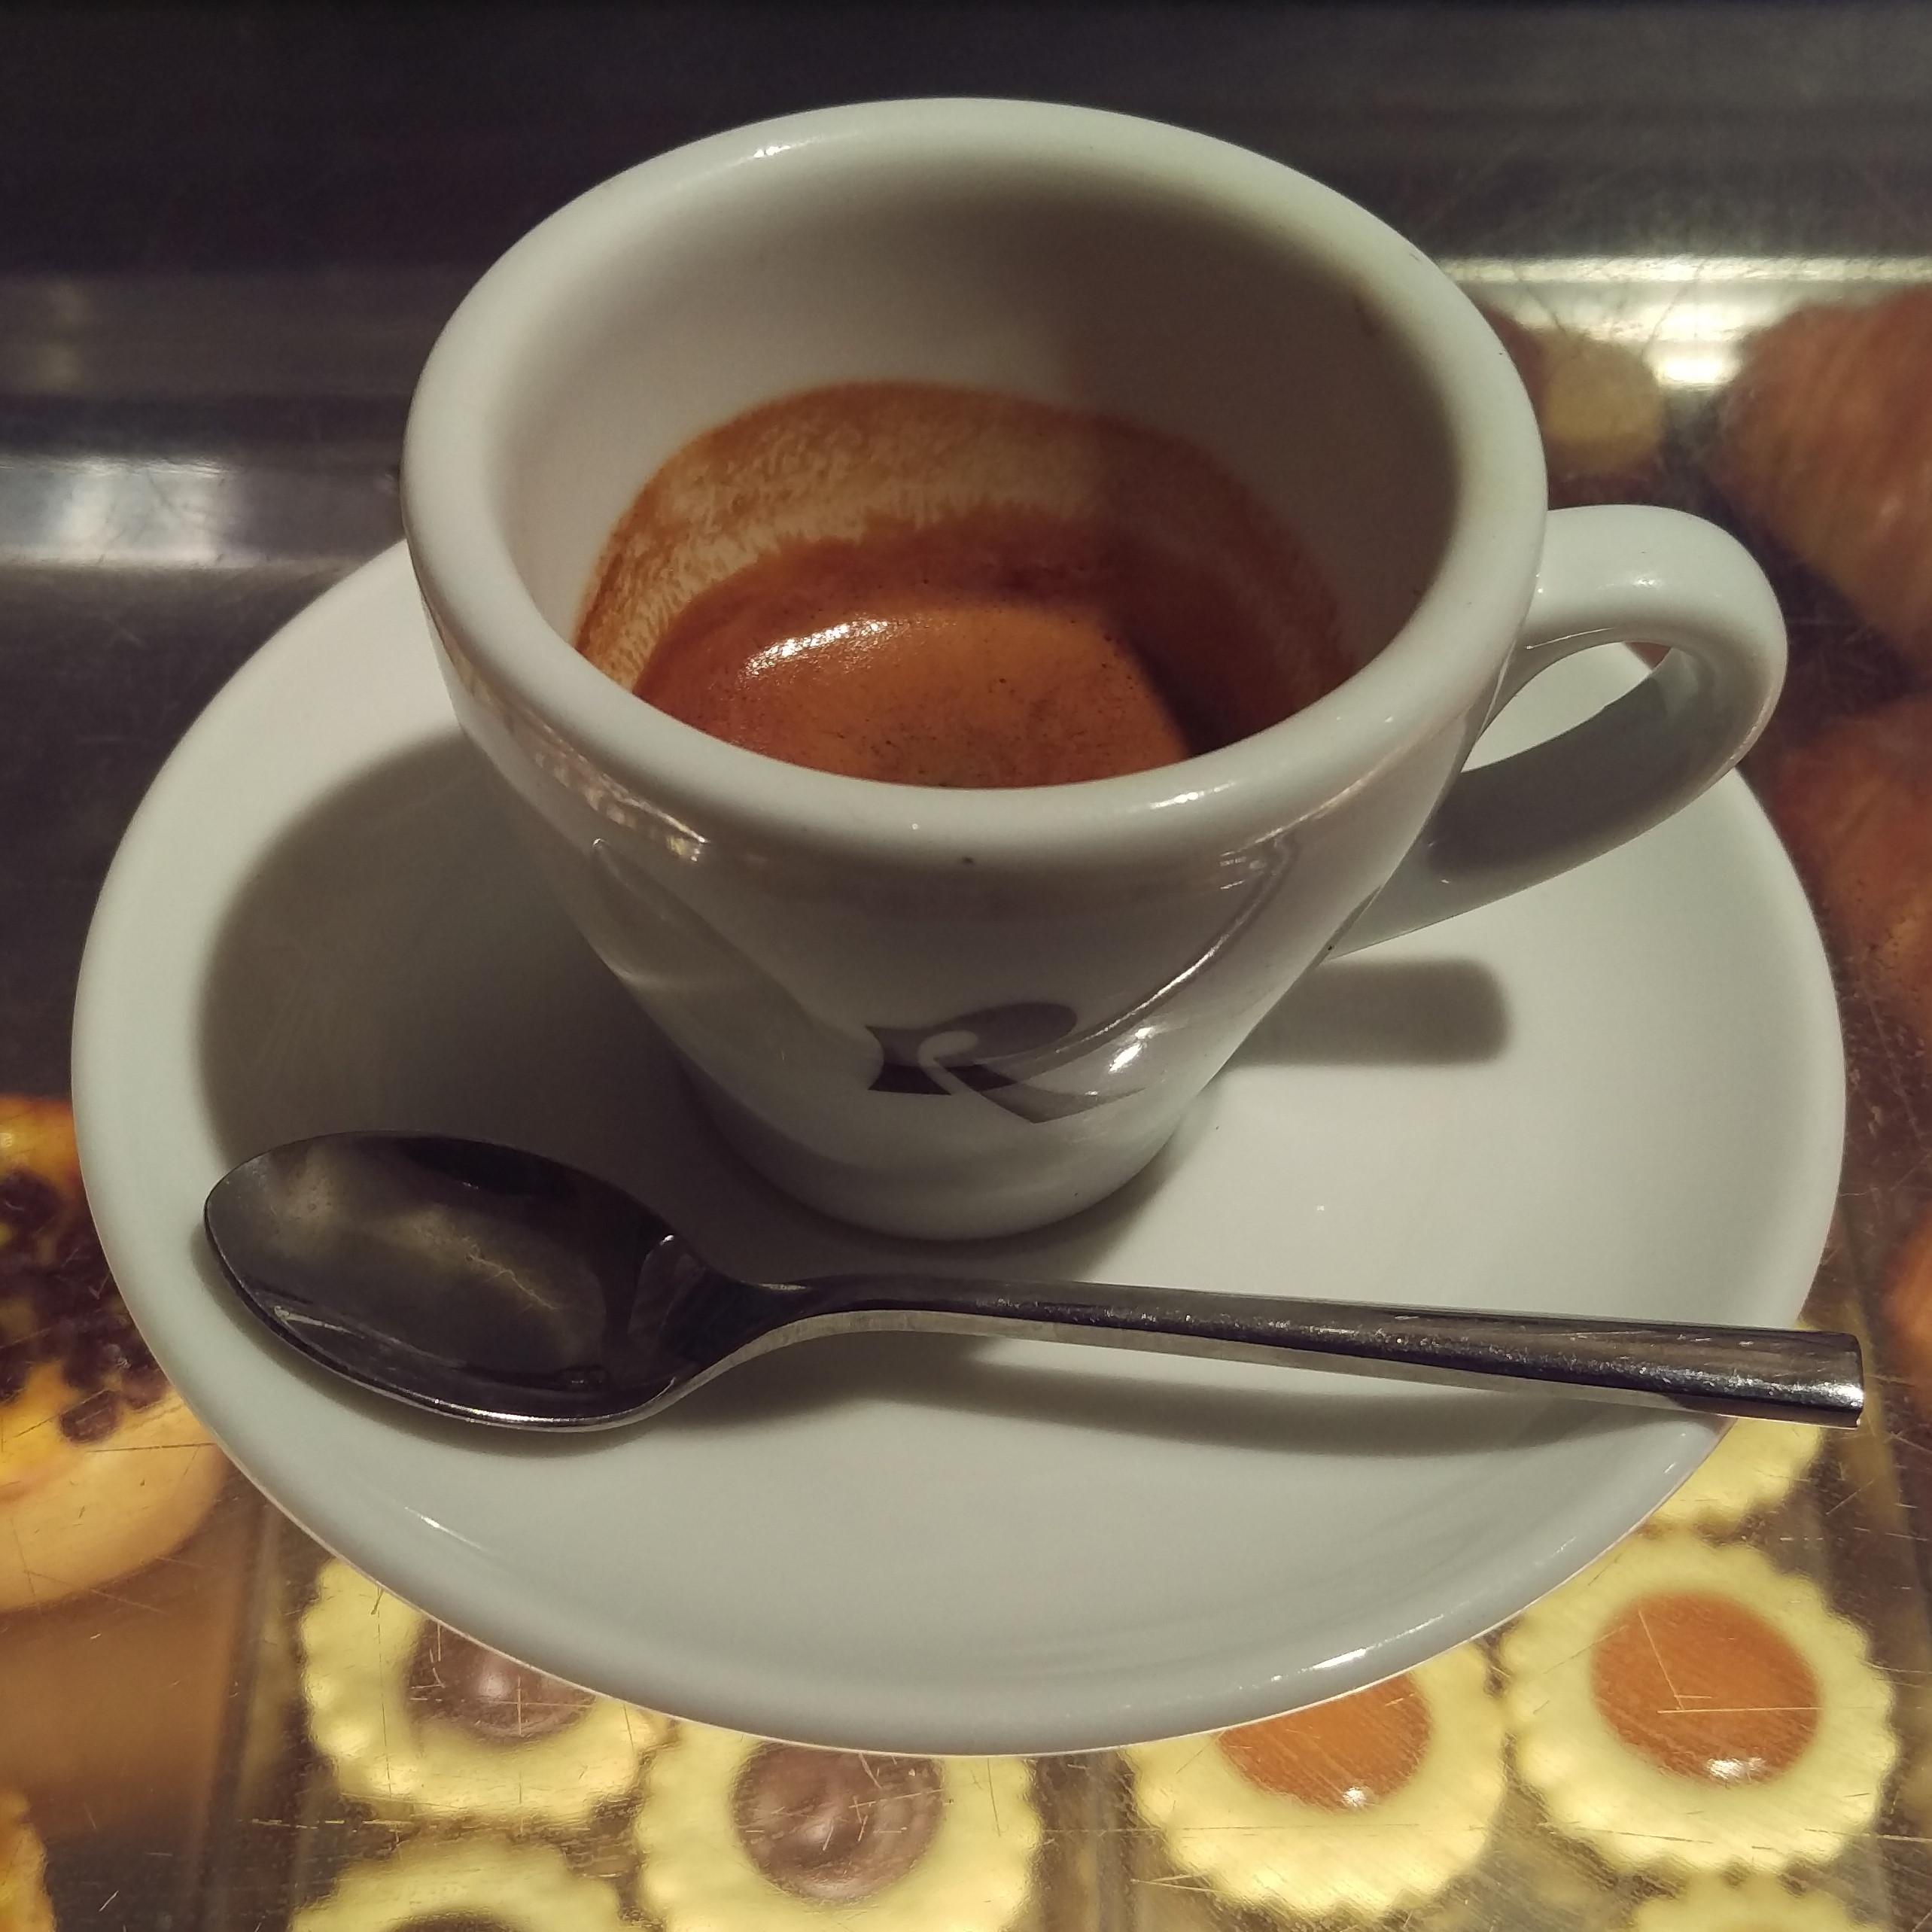 A single espresso in a classic cup at Roscioli Caffè Pasticceria in Rome.